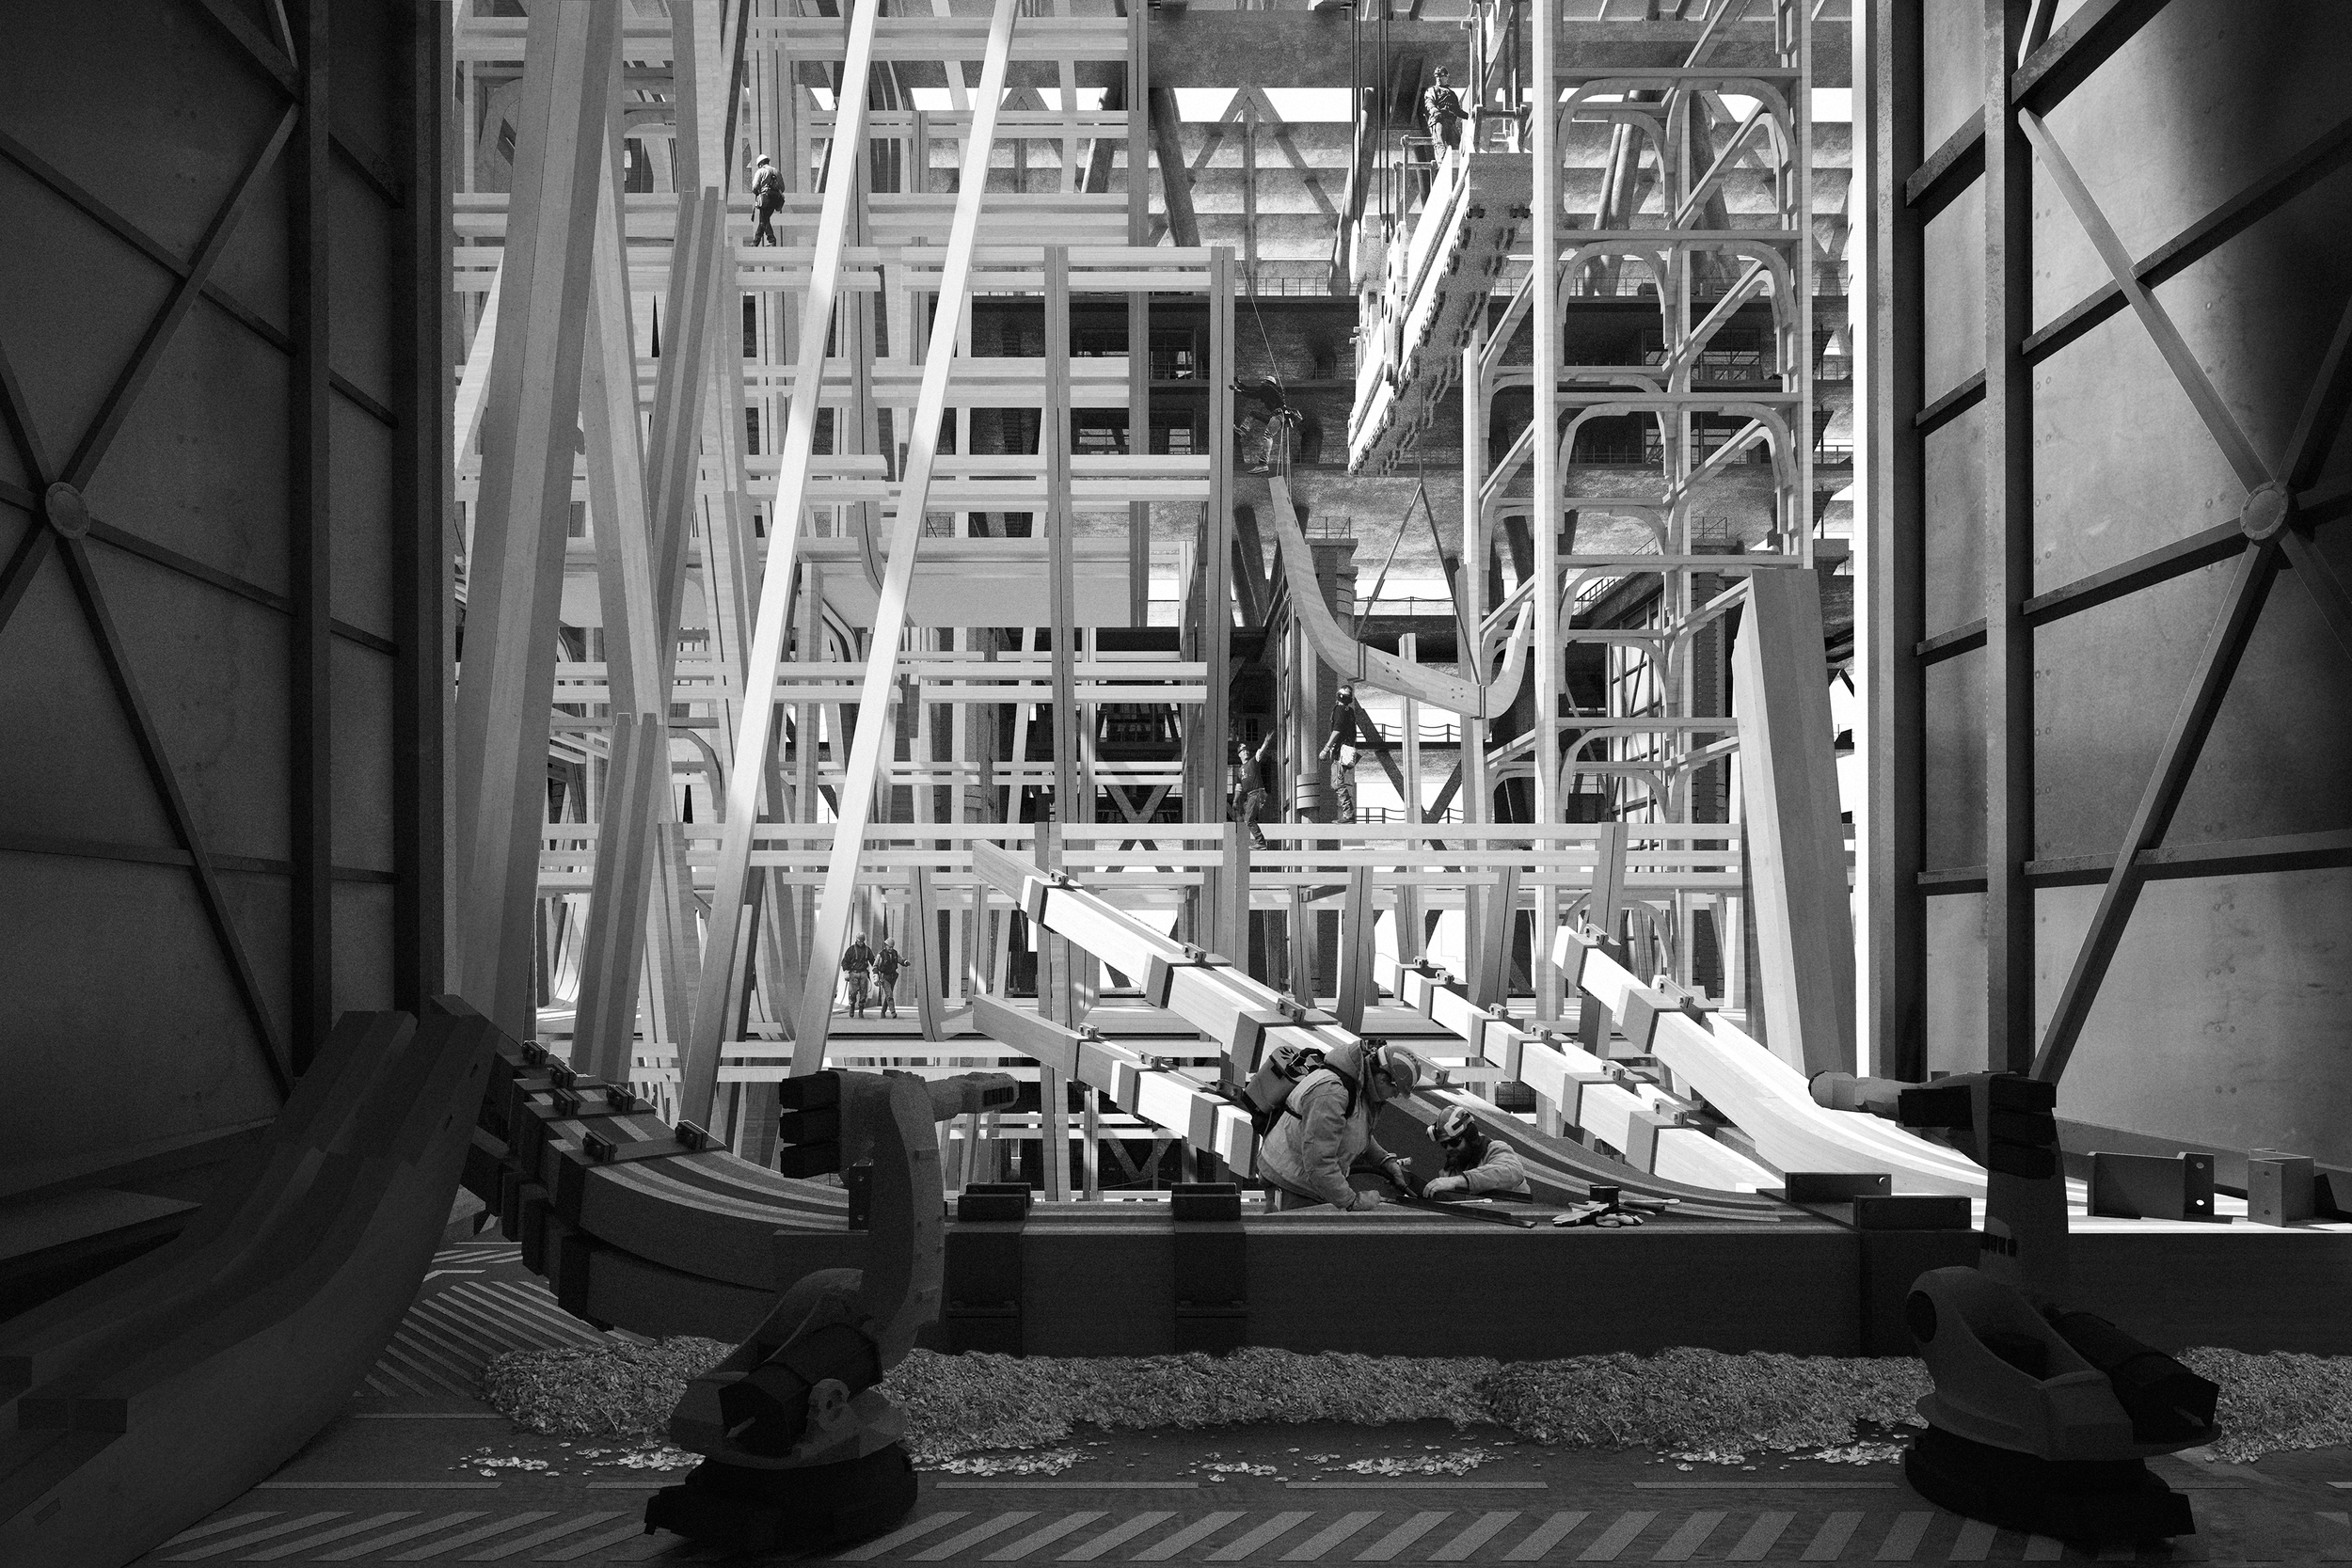 9_Workshop Mezzanine Level-Exposure AC.jpg